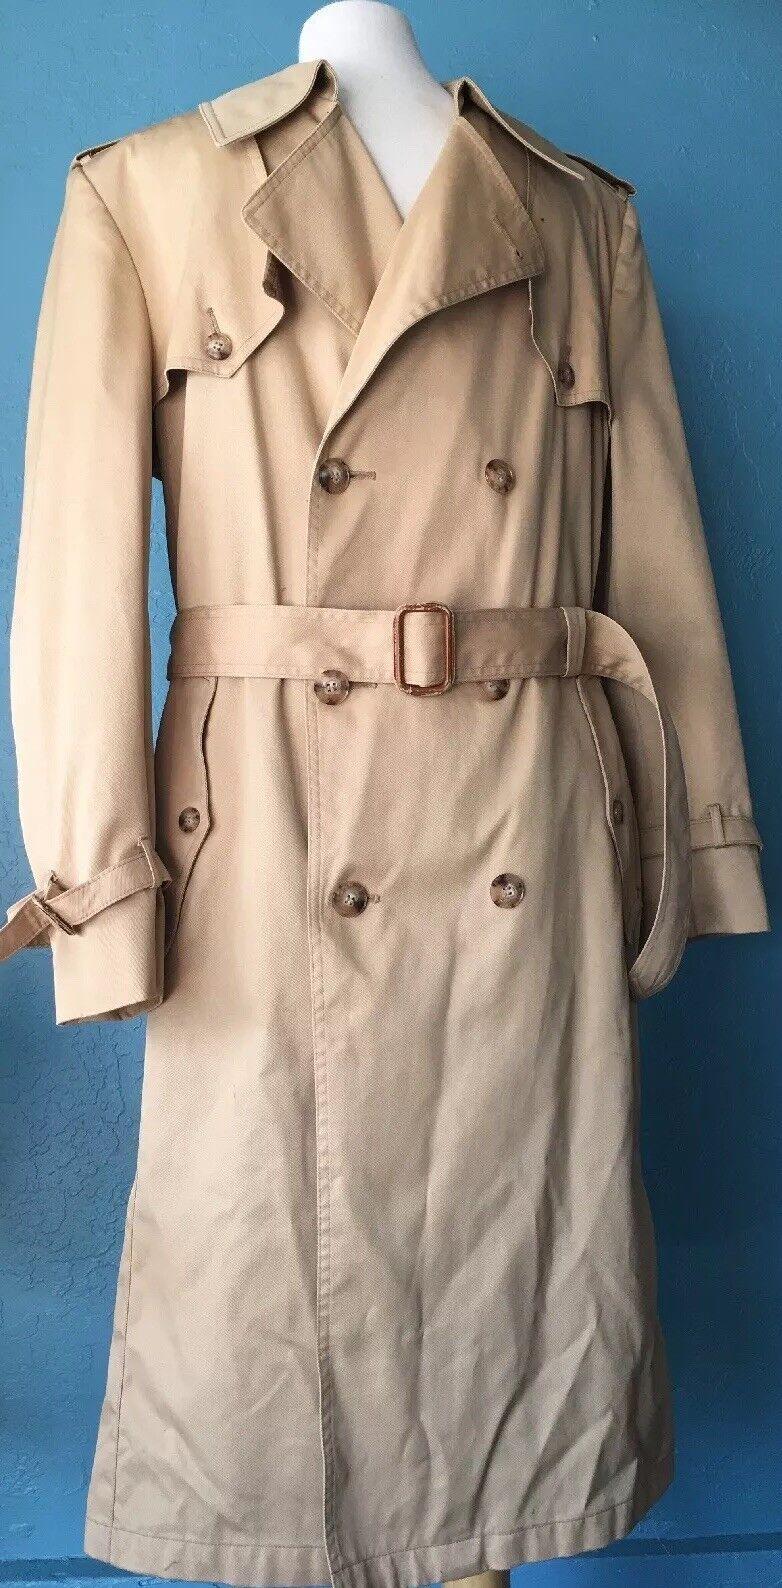 Christian Dior Beige Khaki Men's Double Breasted Long Trench Coat 40R - EU 50